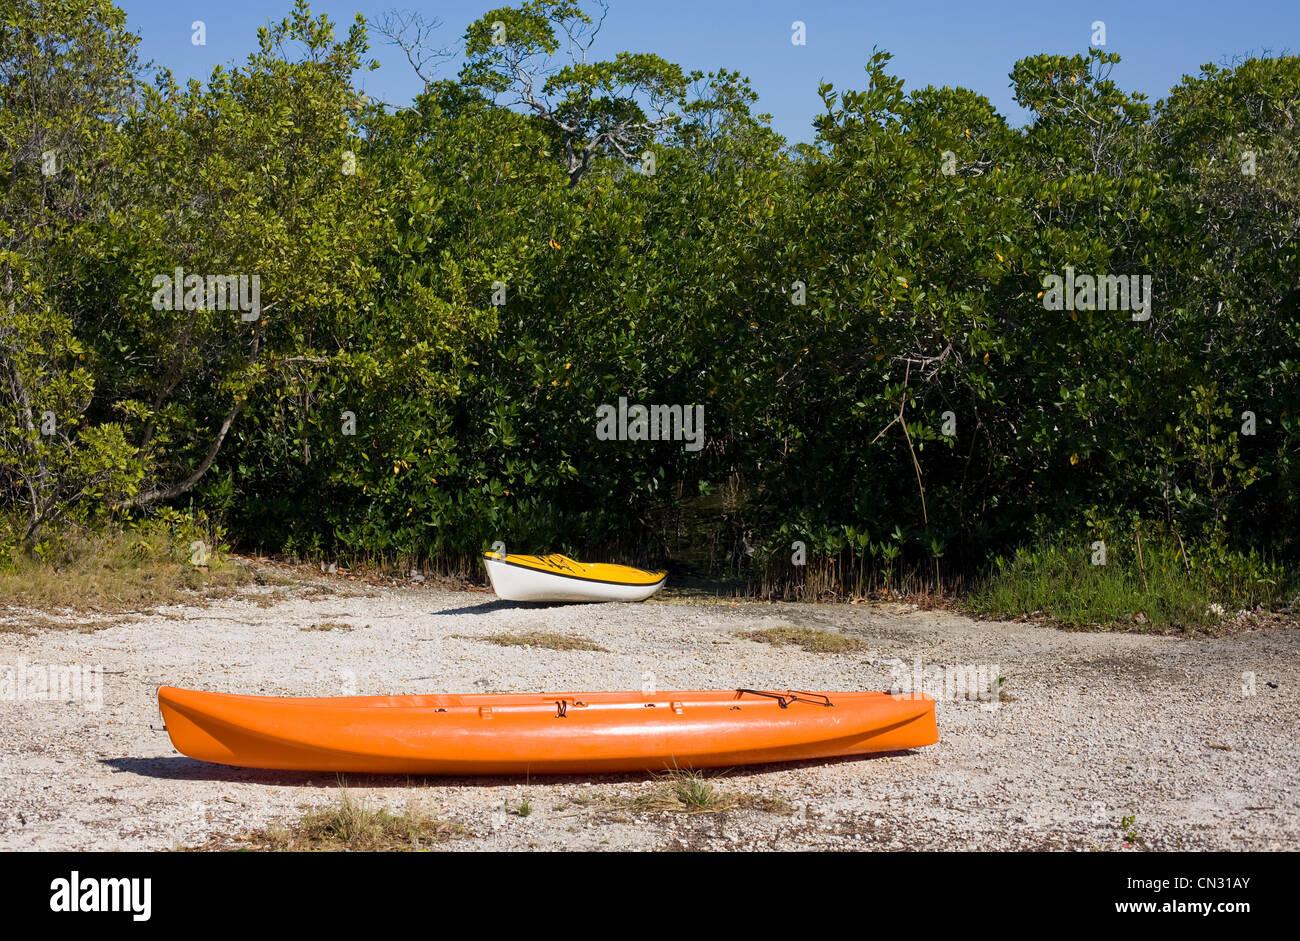 Two kayaks on beach - Stock Image